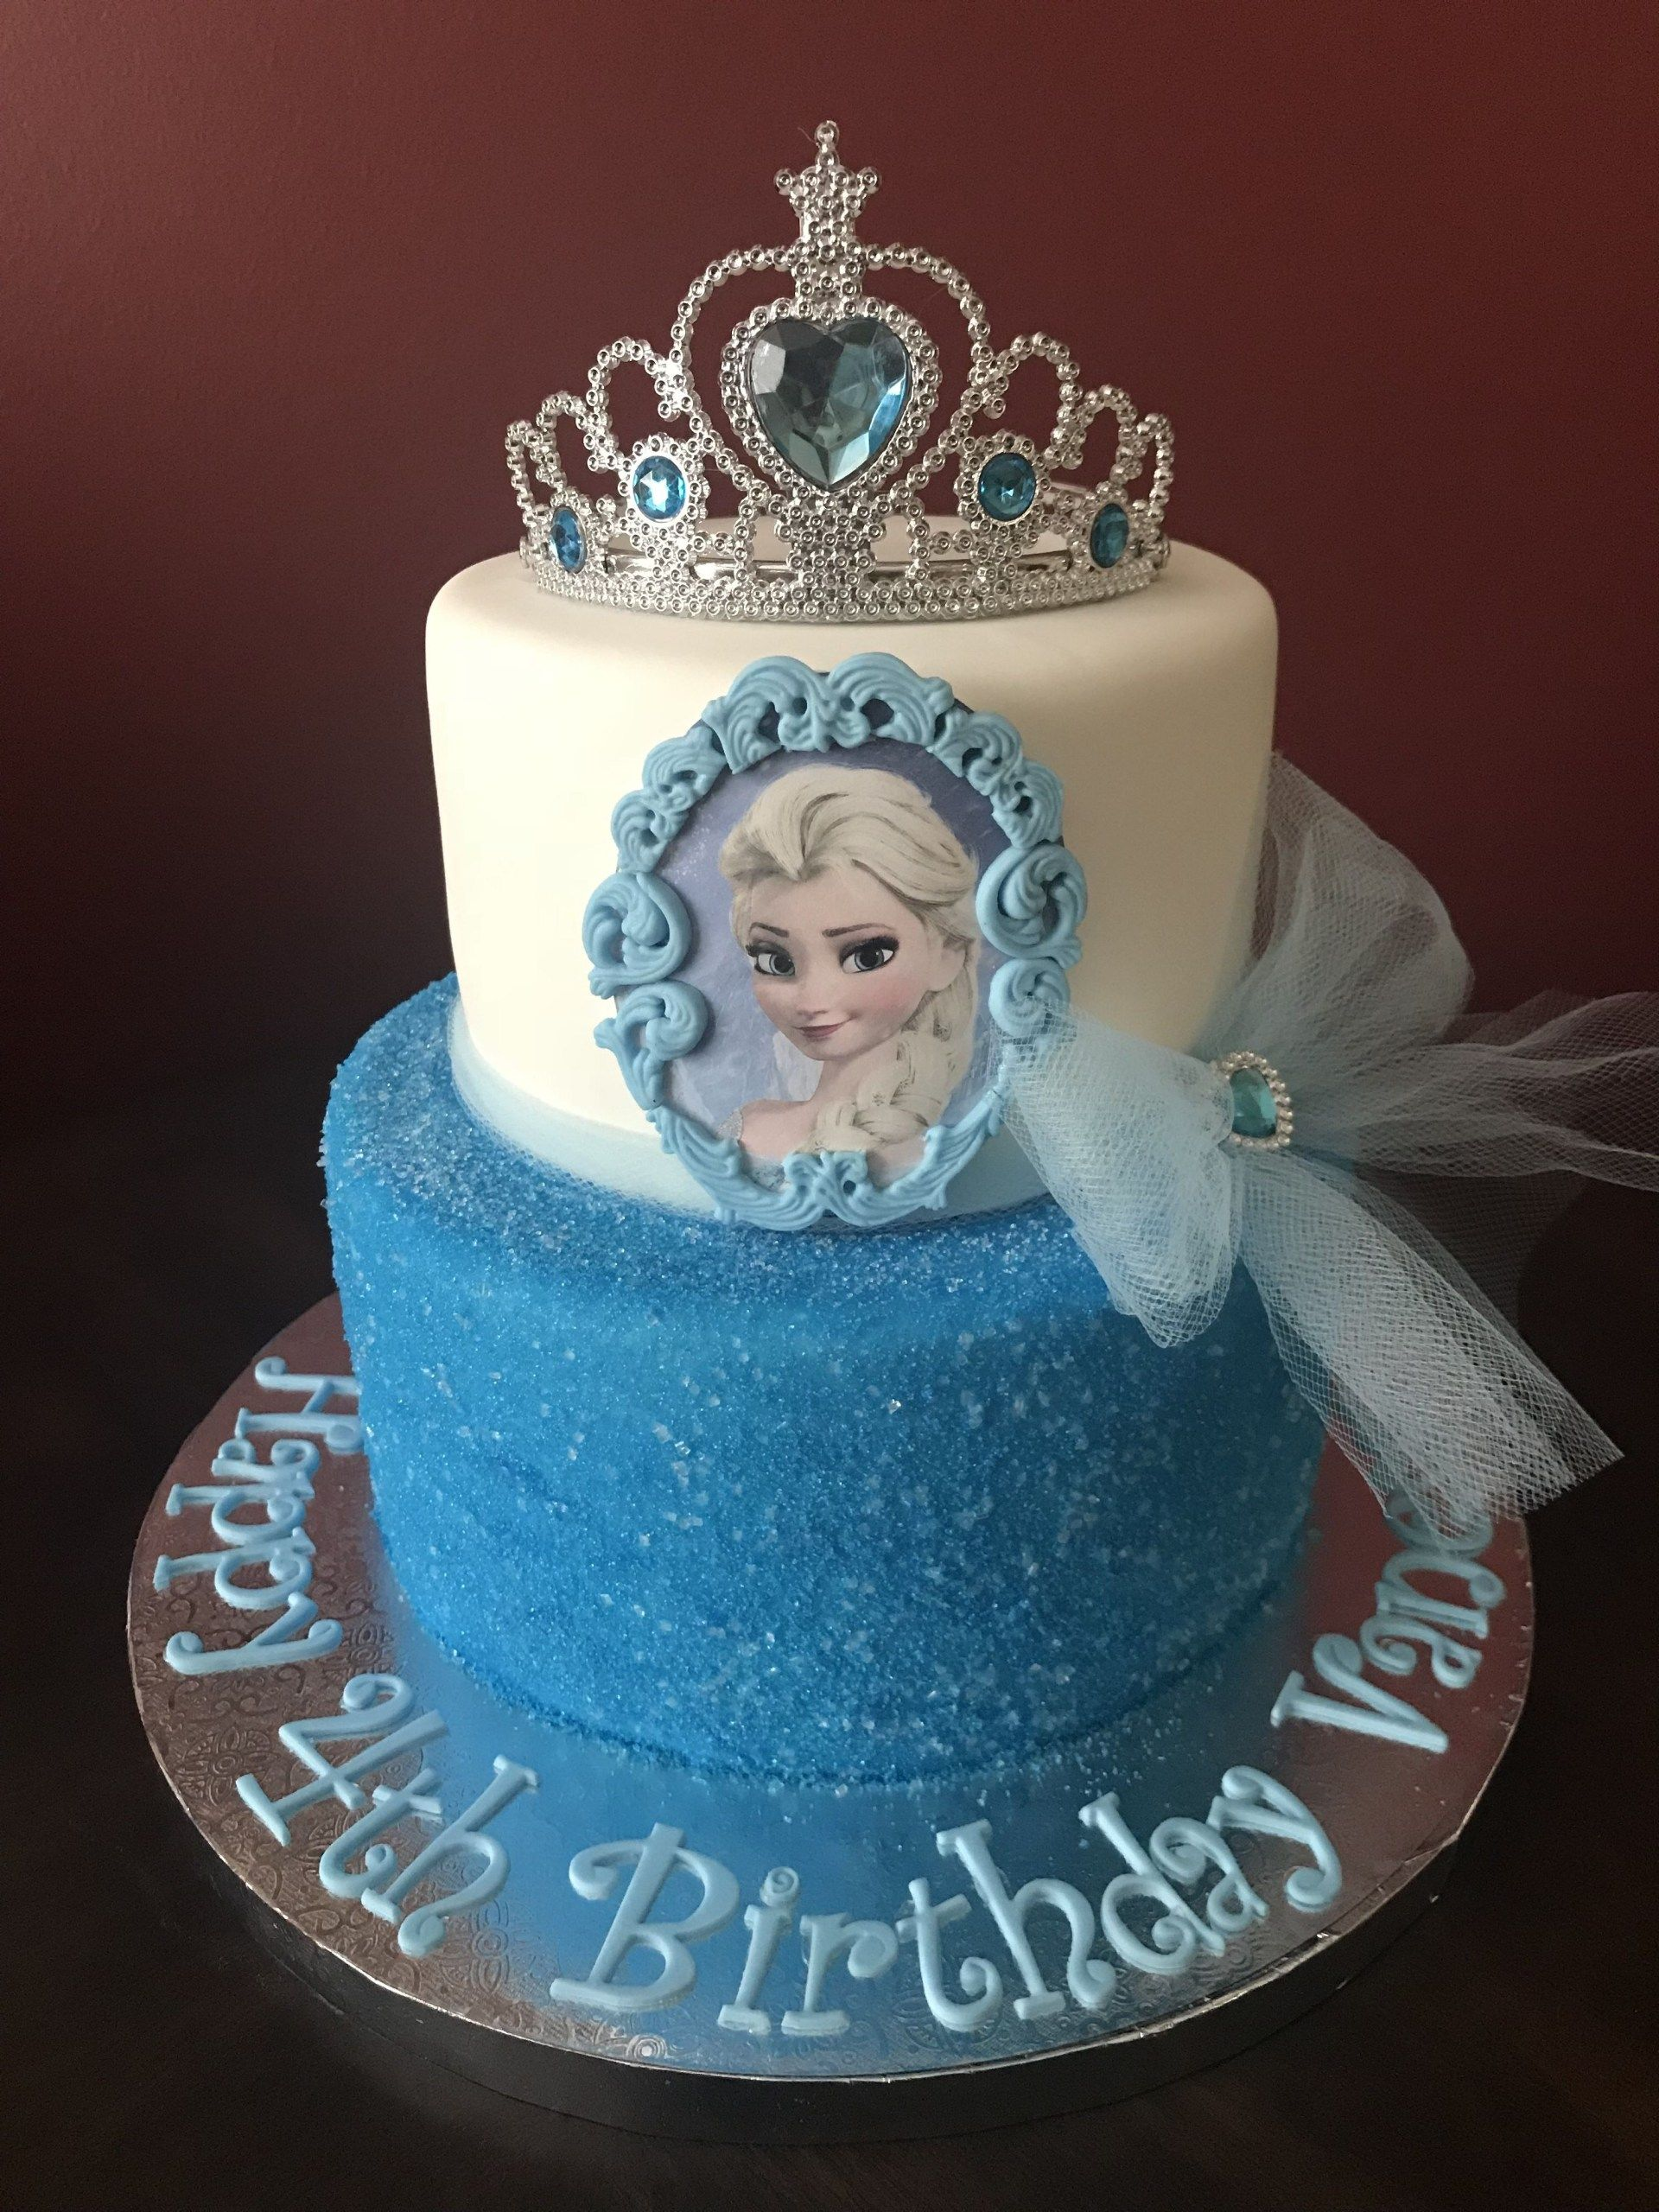 Admirable Frozen Birthday Cake Ideas Frozen Elsa Birthday Cake Birthday Funny Birthday Cards Online Barepcheapnameinfo